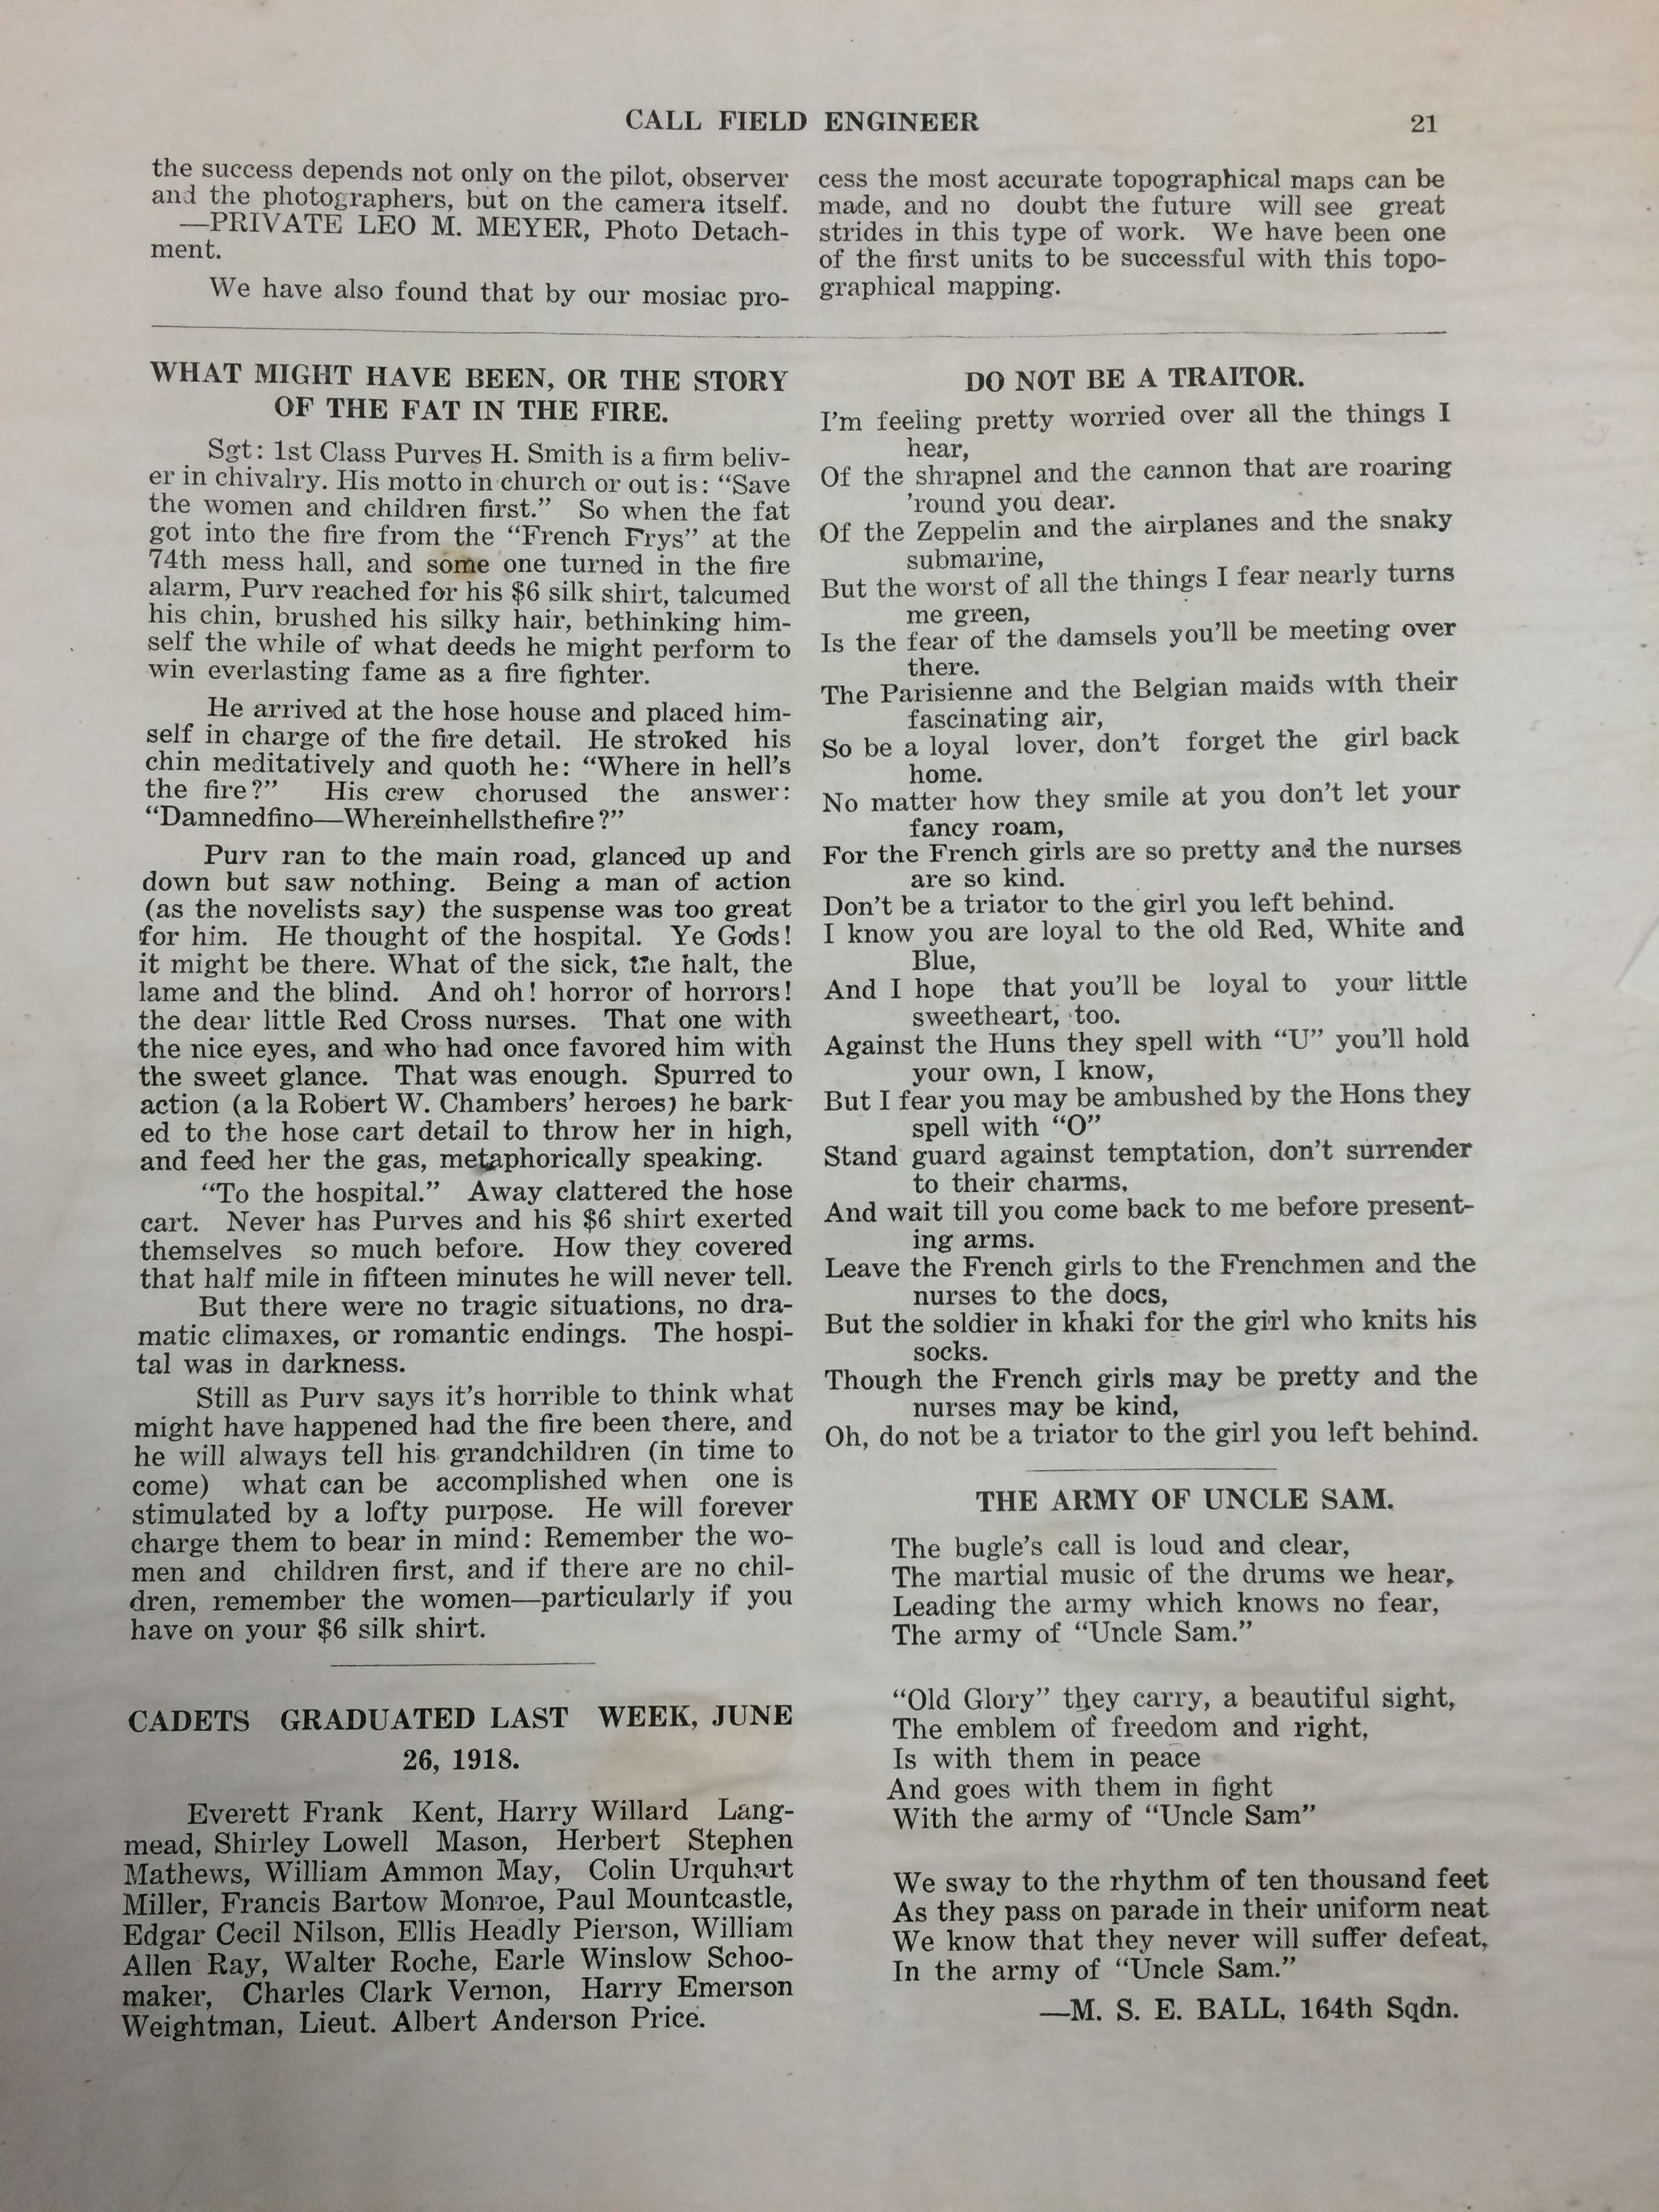 Image 23 July 1918 Call Field Engineer